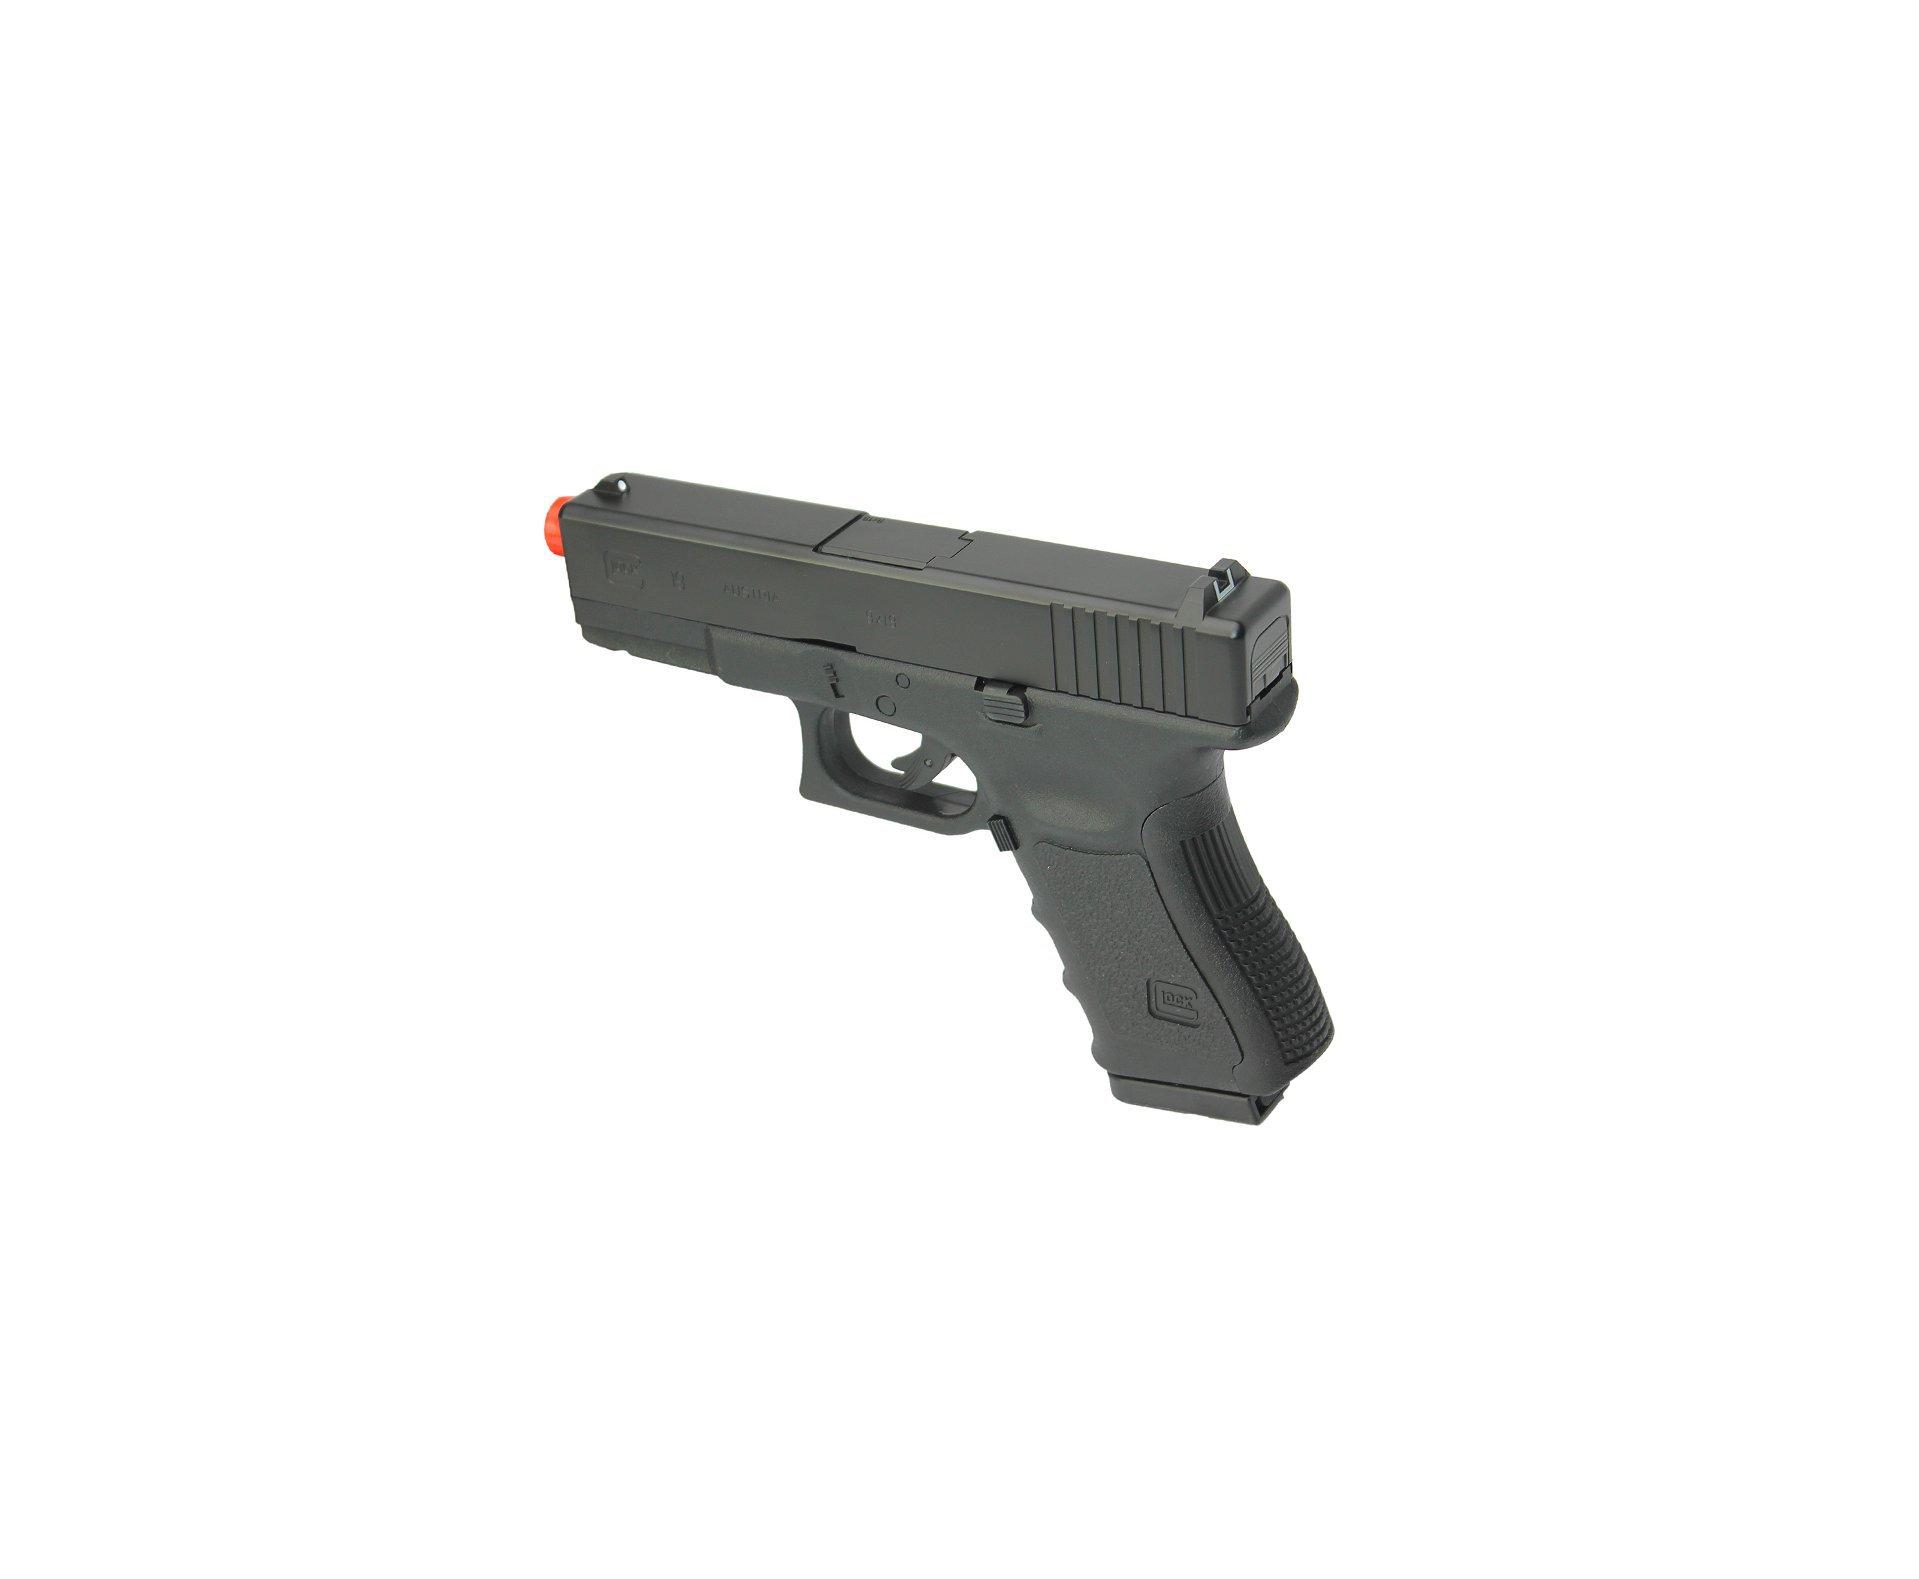 Pistola De Airsoft Gas Co2 Glock G19 Slide Metal Oficial Cal 6mm